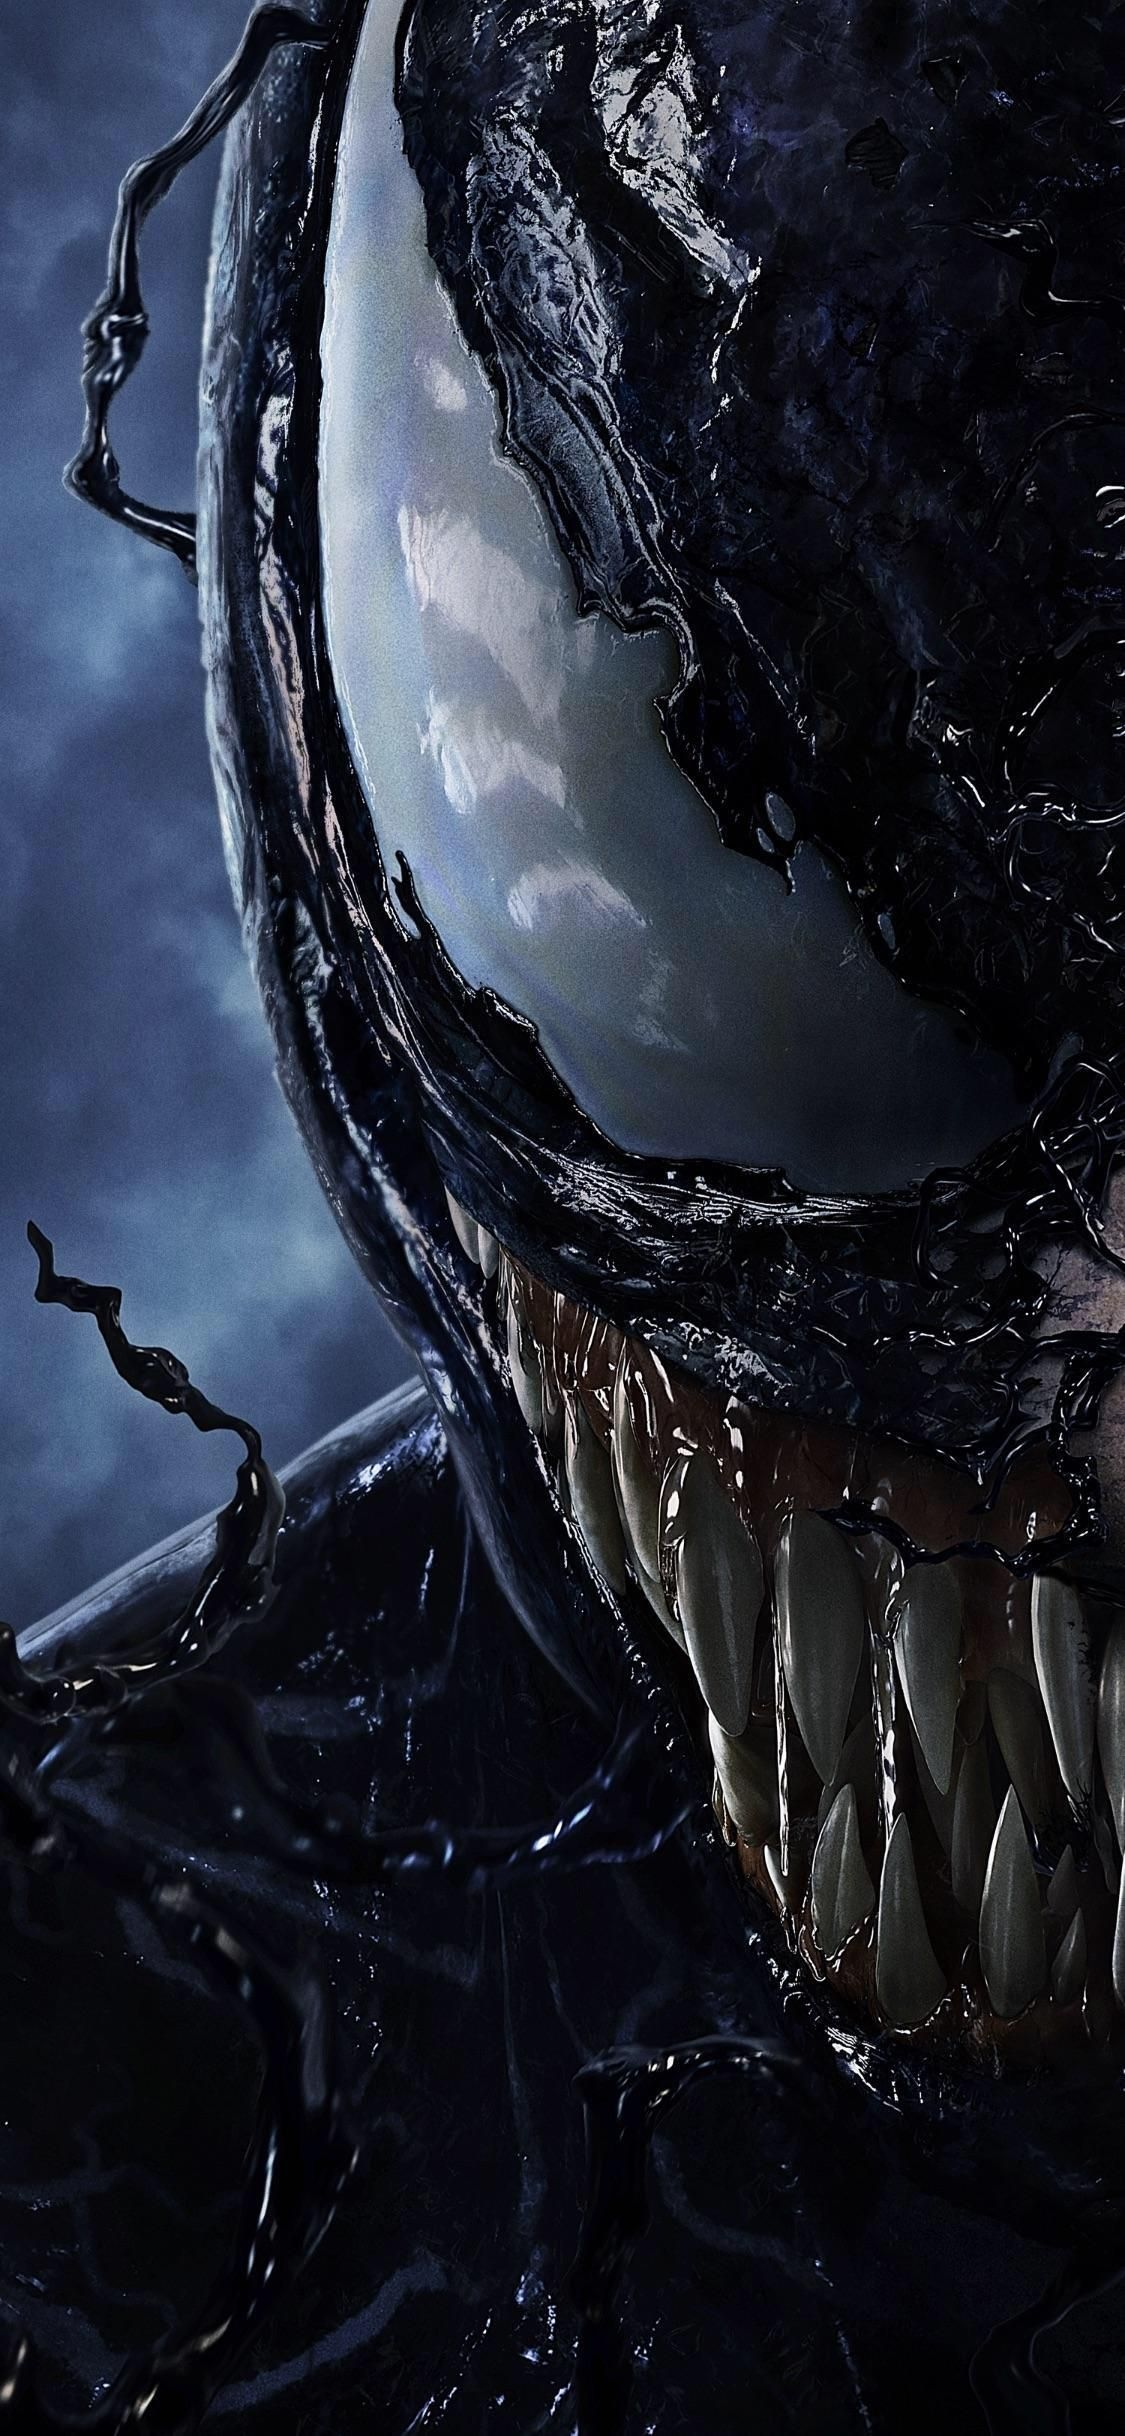 Venom Live Wallpapers Top Free Venom Live Backgrounds Wallpaperaccess